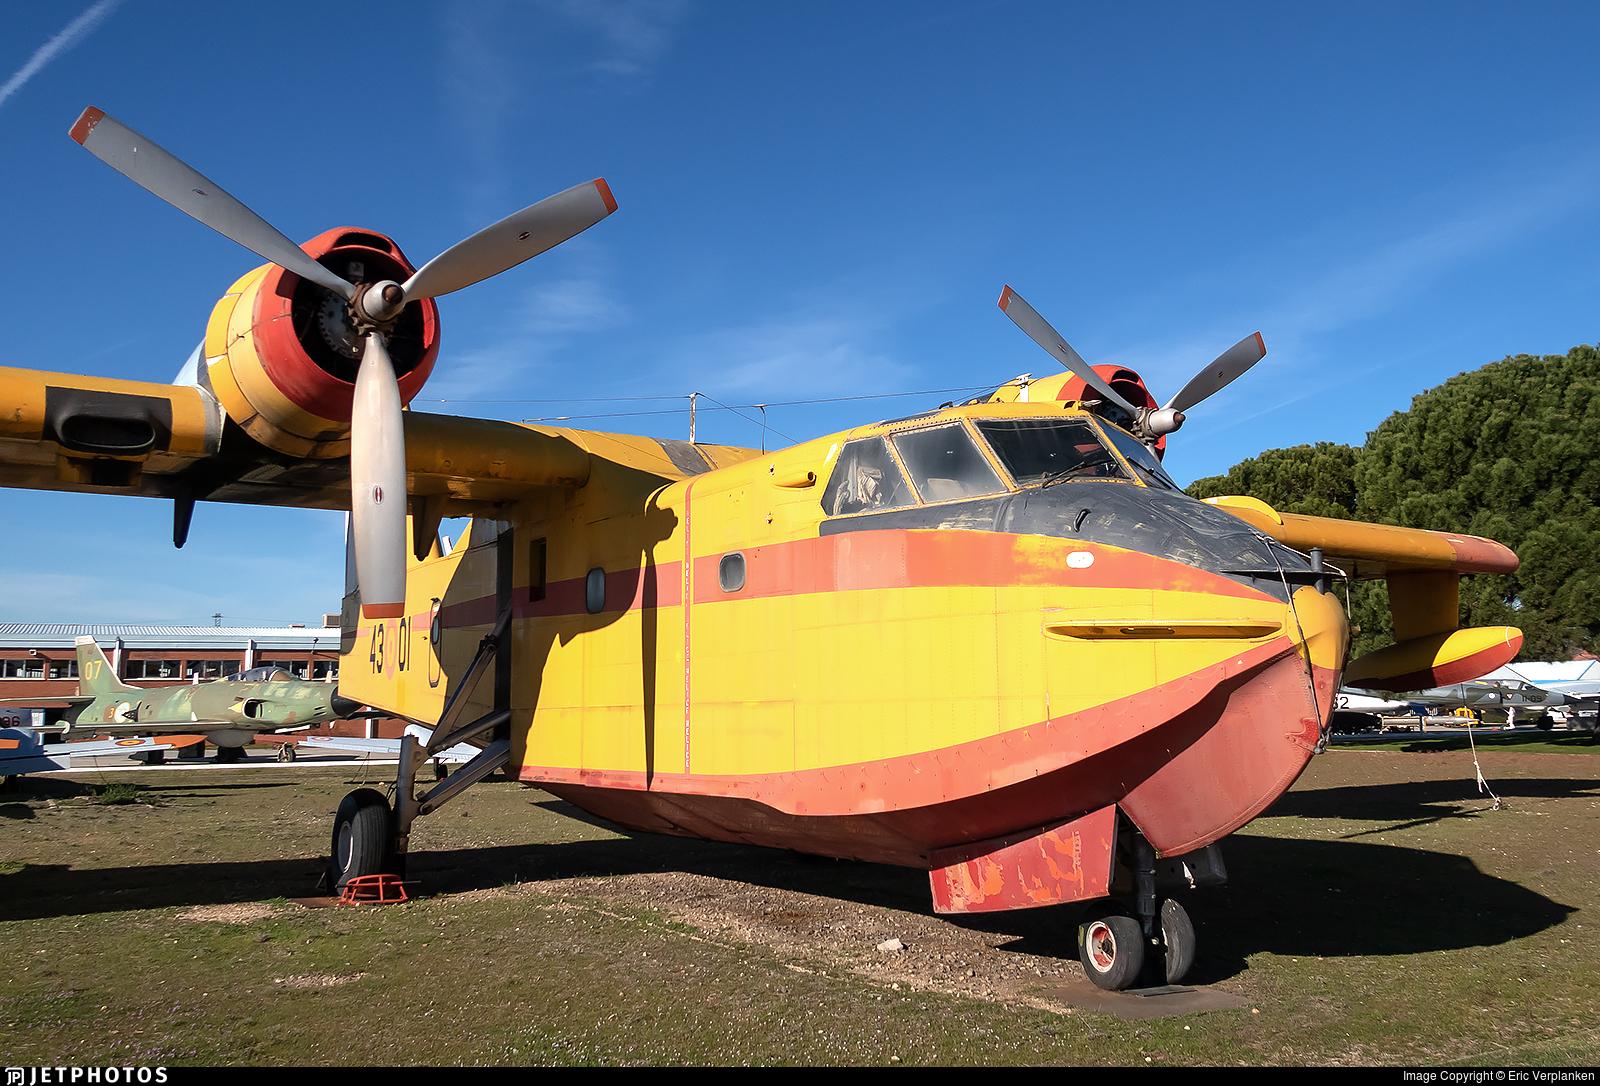 UD.13-01 - Canadair CL-215-1A10 - Spain - Air Force